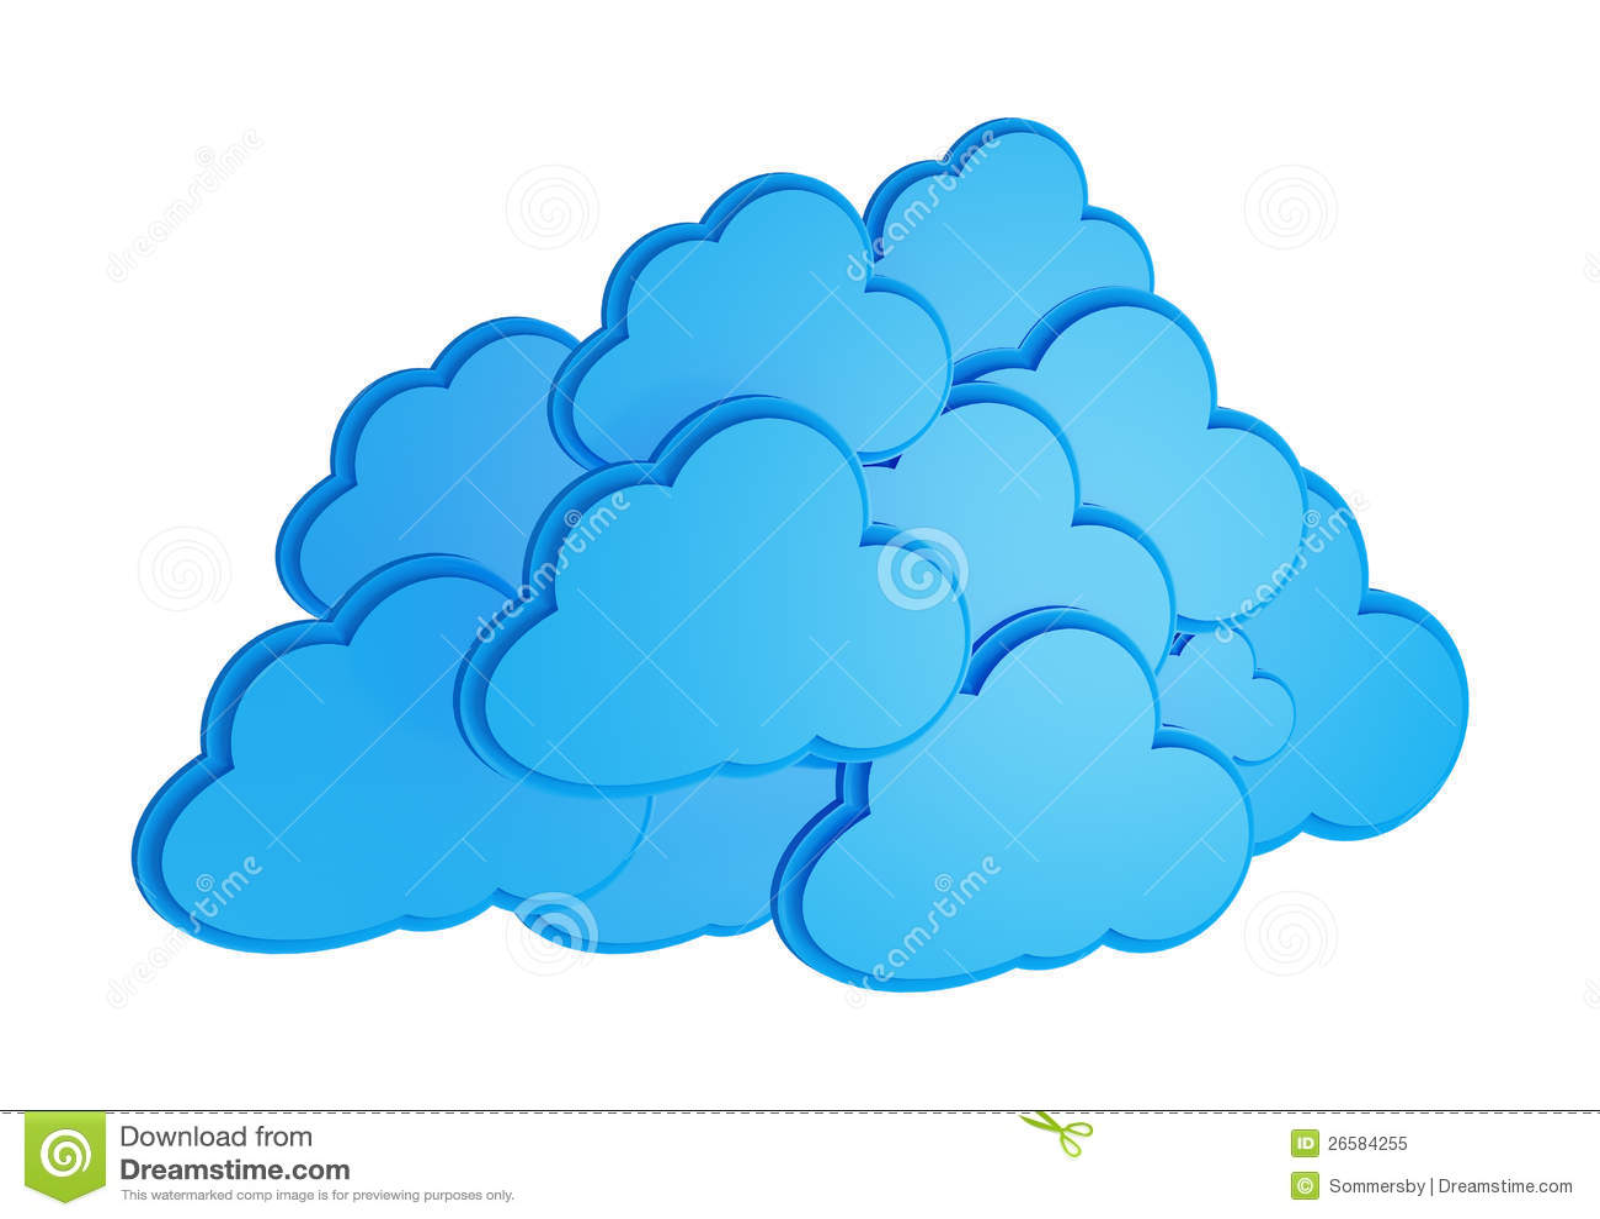 3d Cloud Computing Icon Royalty Free Stock Photo - Image: 26584255: dreamstime.com/royalty-free-stock-photo-3d-cloud-computing-icon...